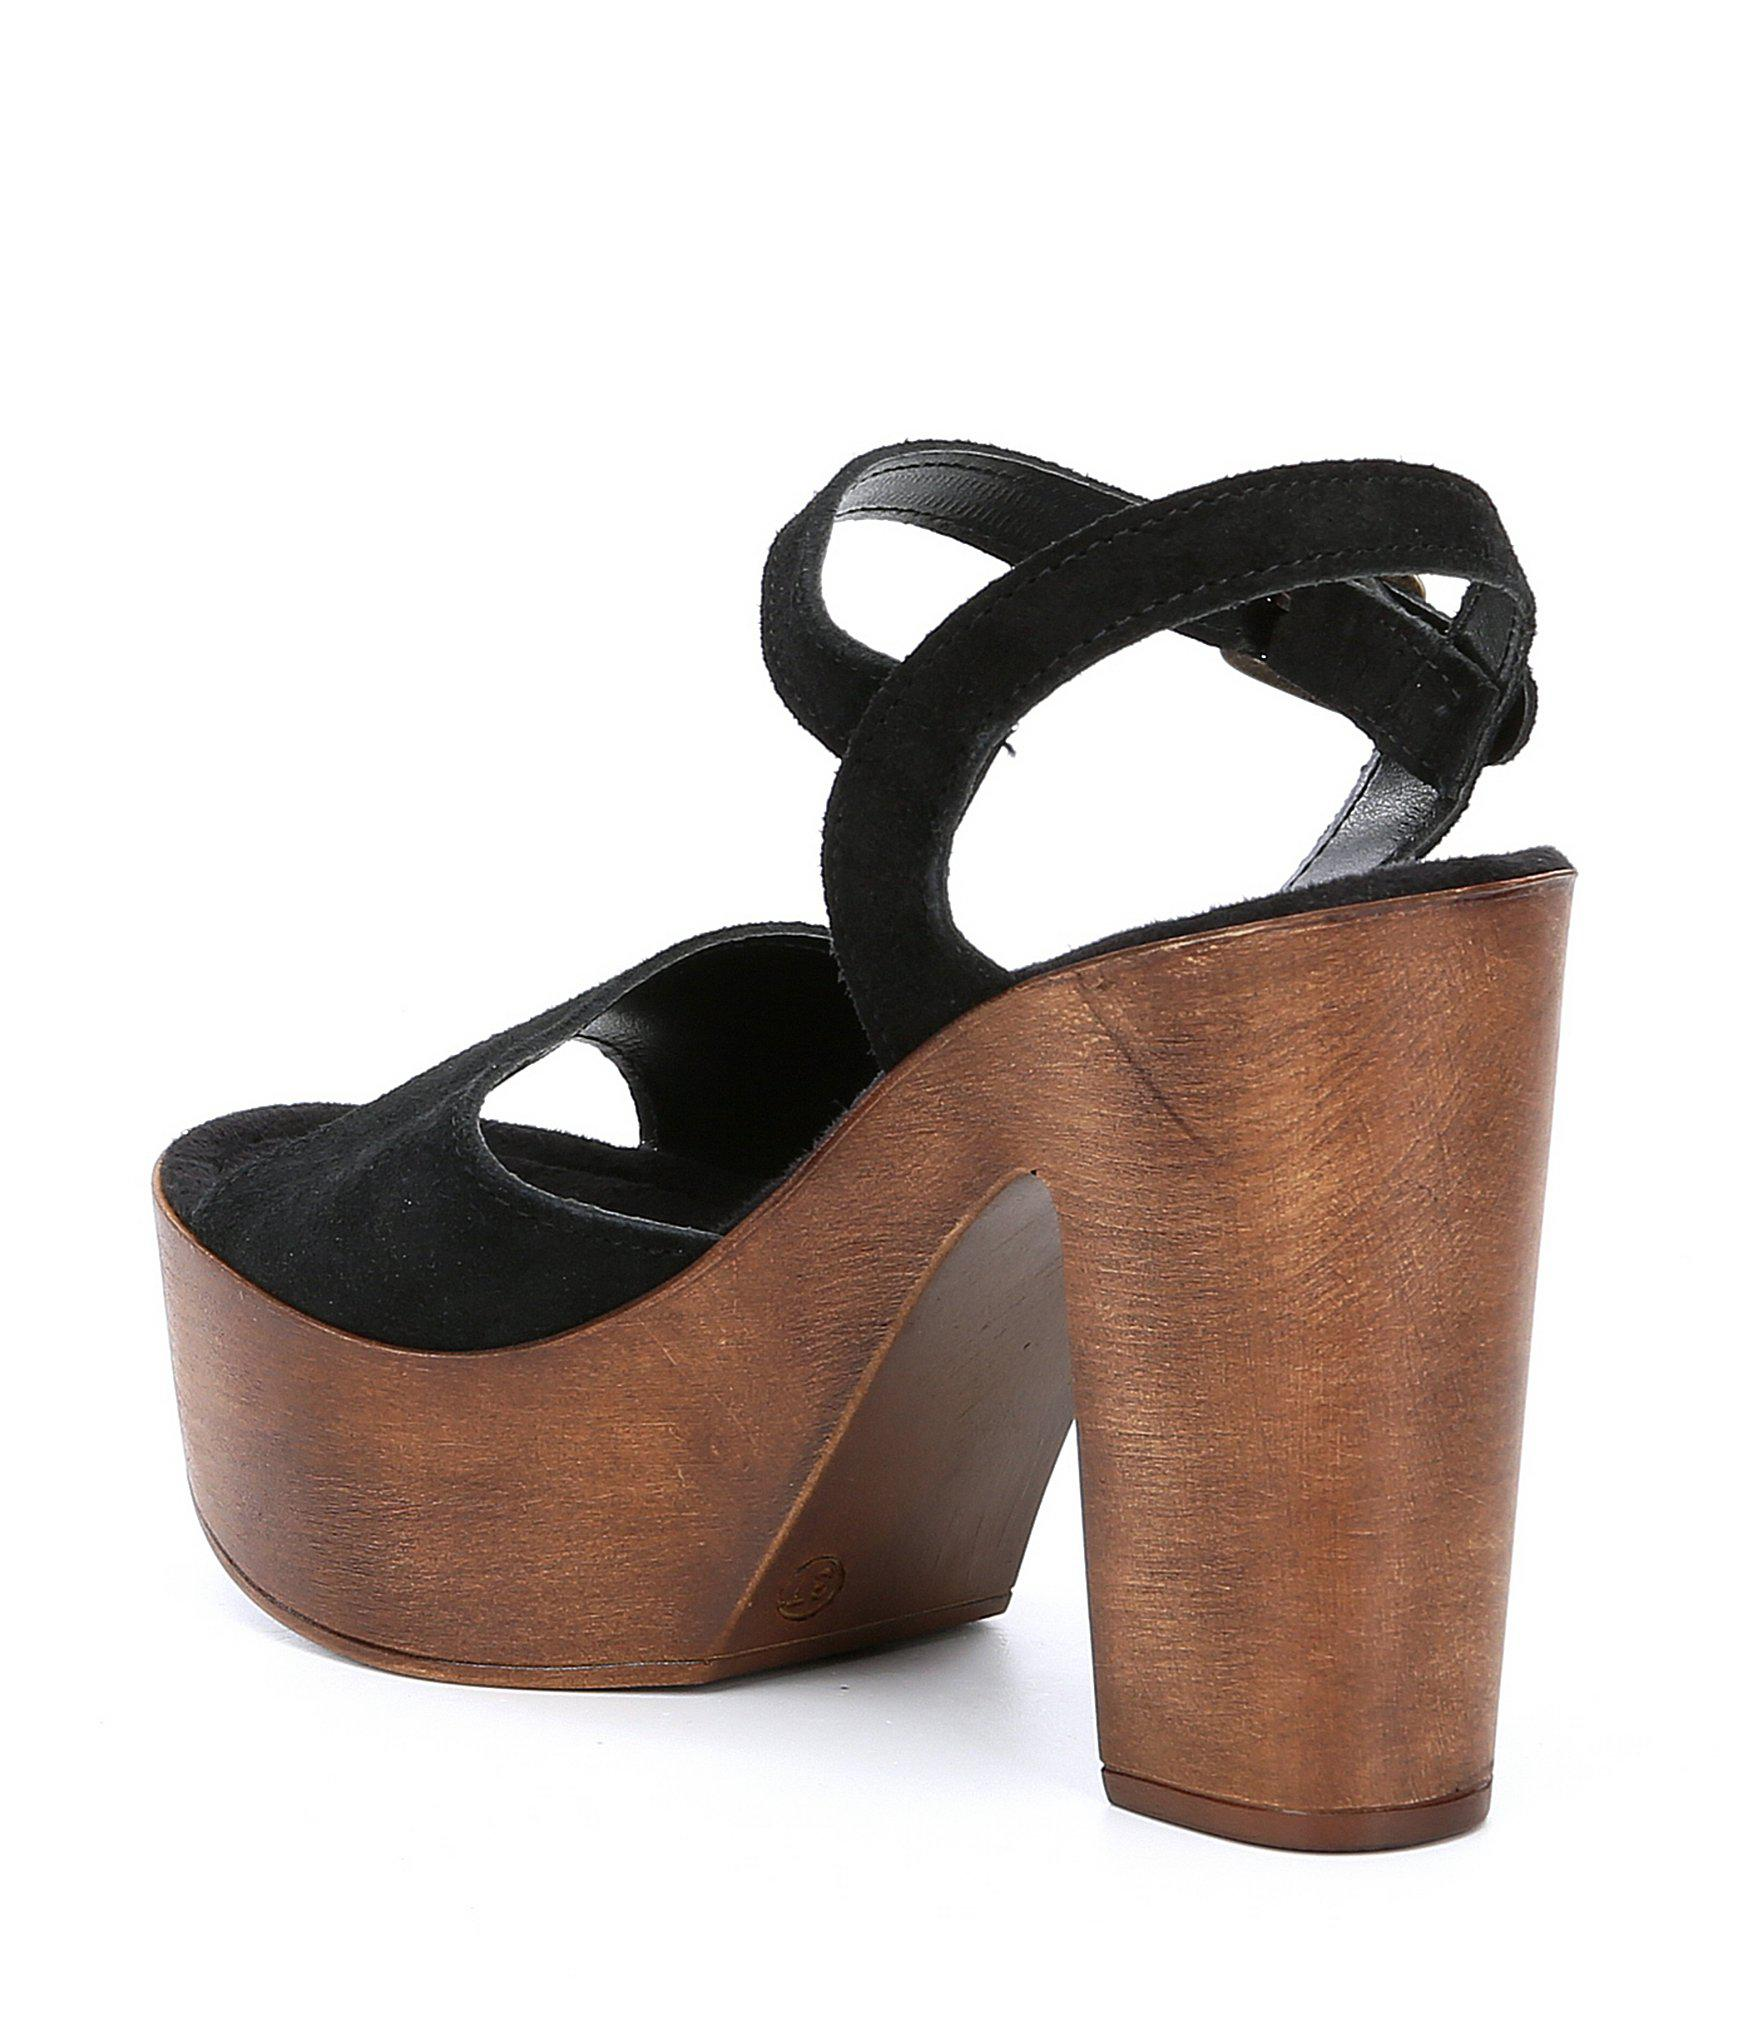 95b9a54b83fc Lyst - Steve Madden Lulla Suede Platform Block Heel Sandals in Black